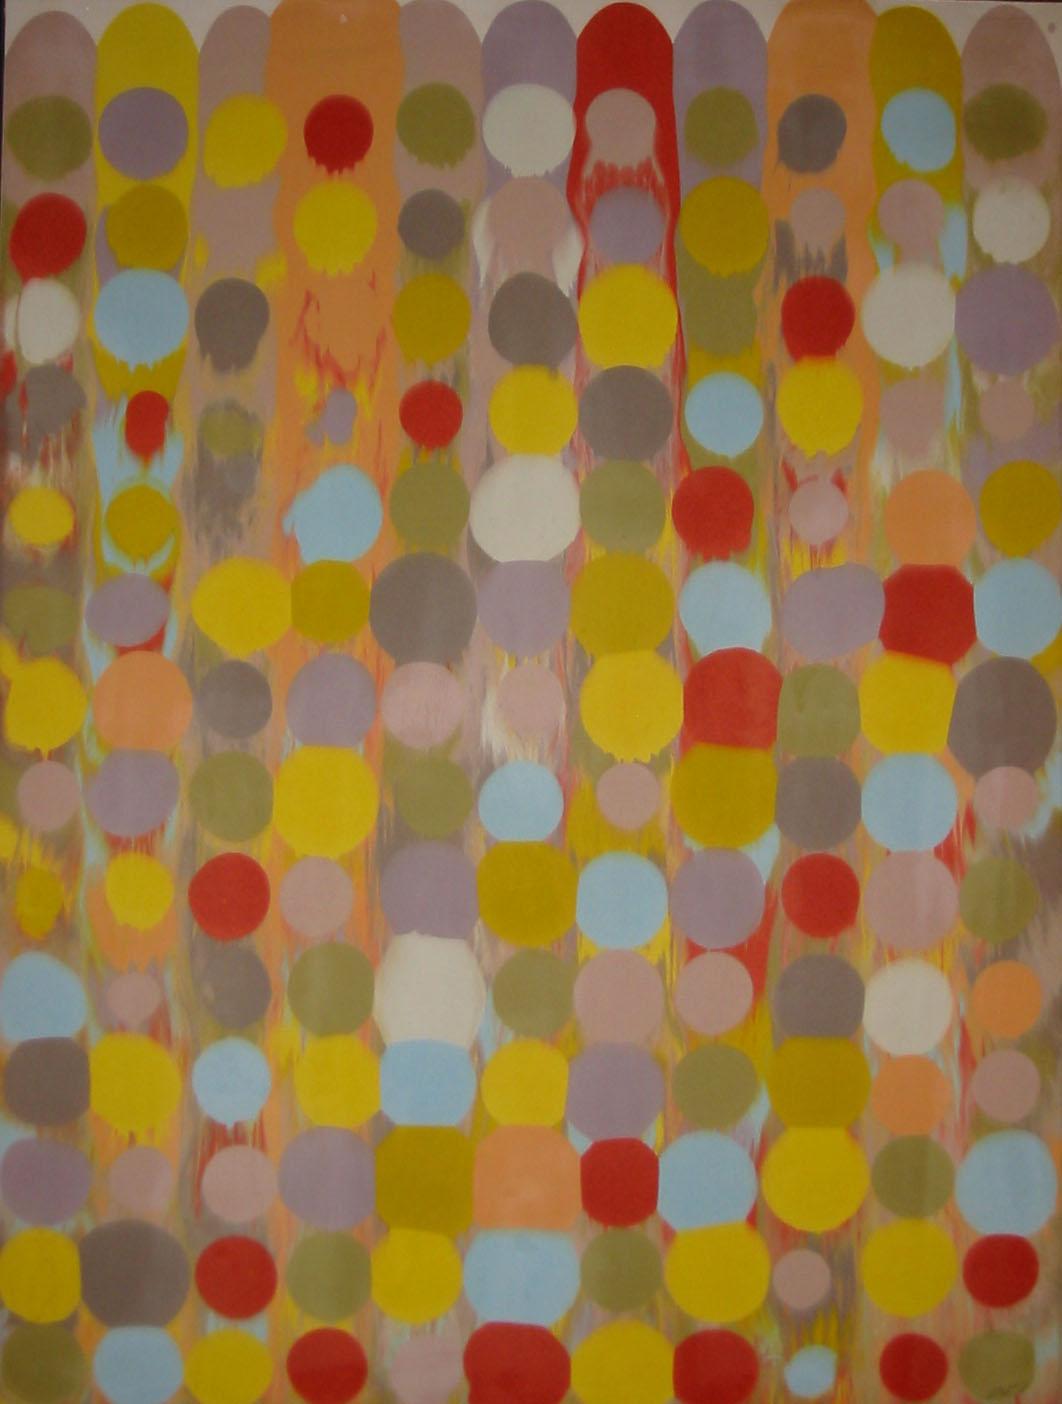 Point Array, Series I, No. 9